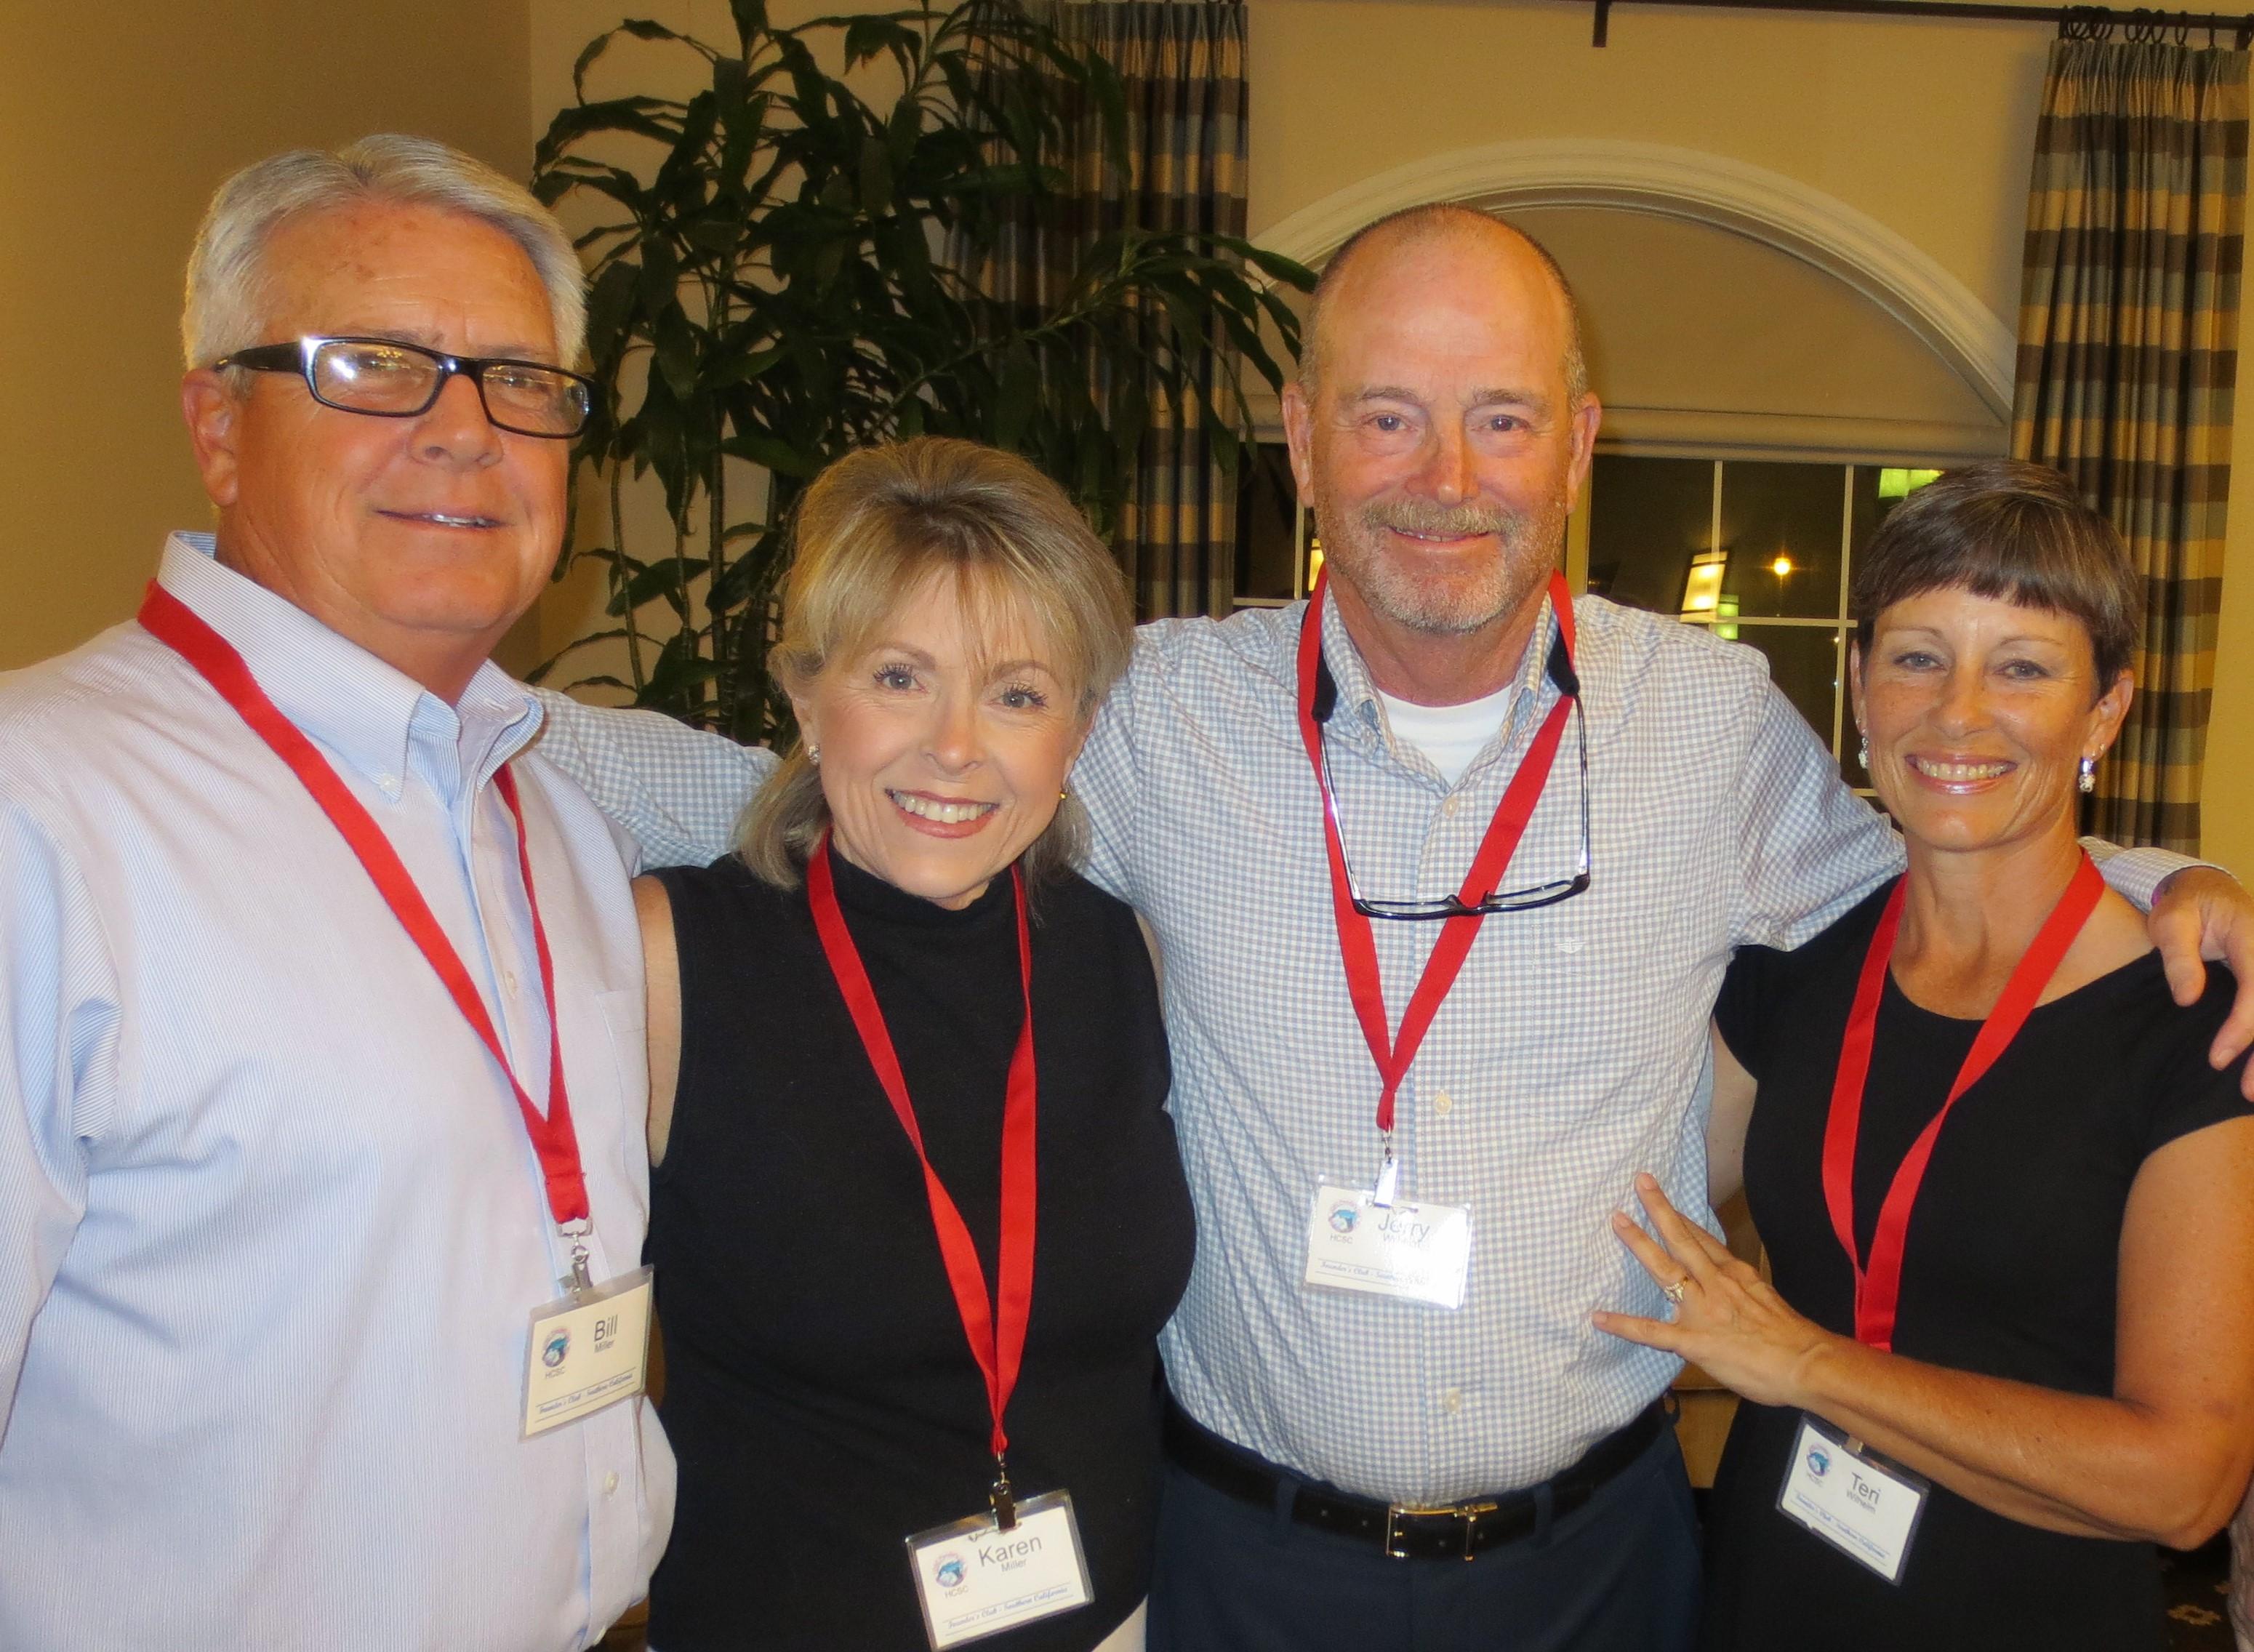 Bill and Karen Miller alongside Jerry and Terri  Wilhelm